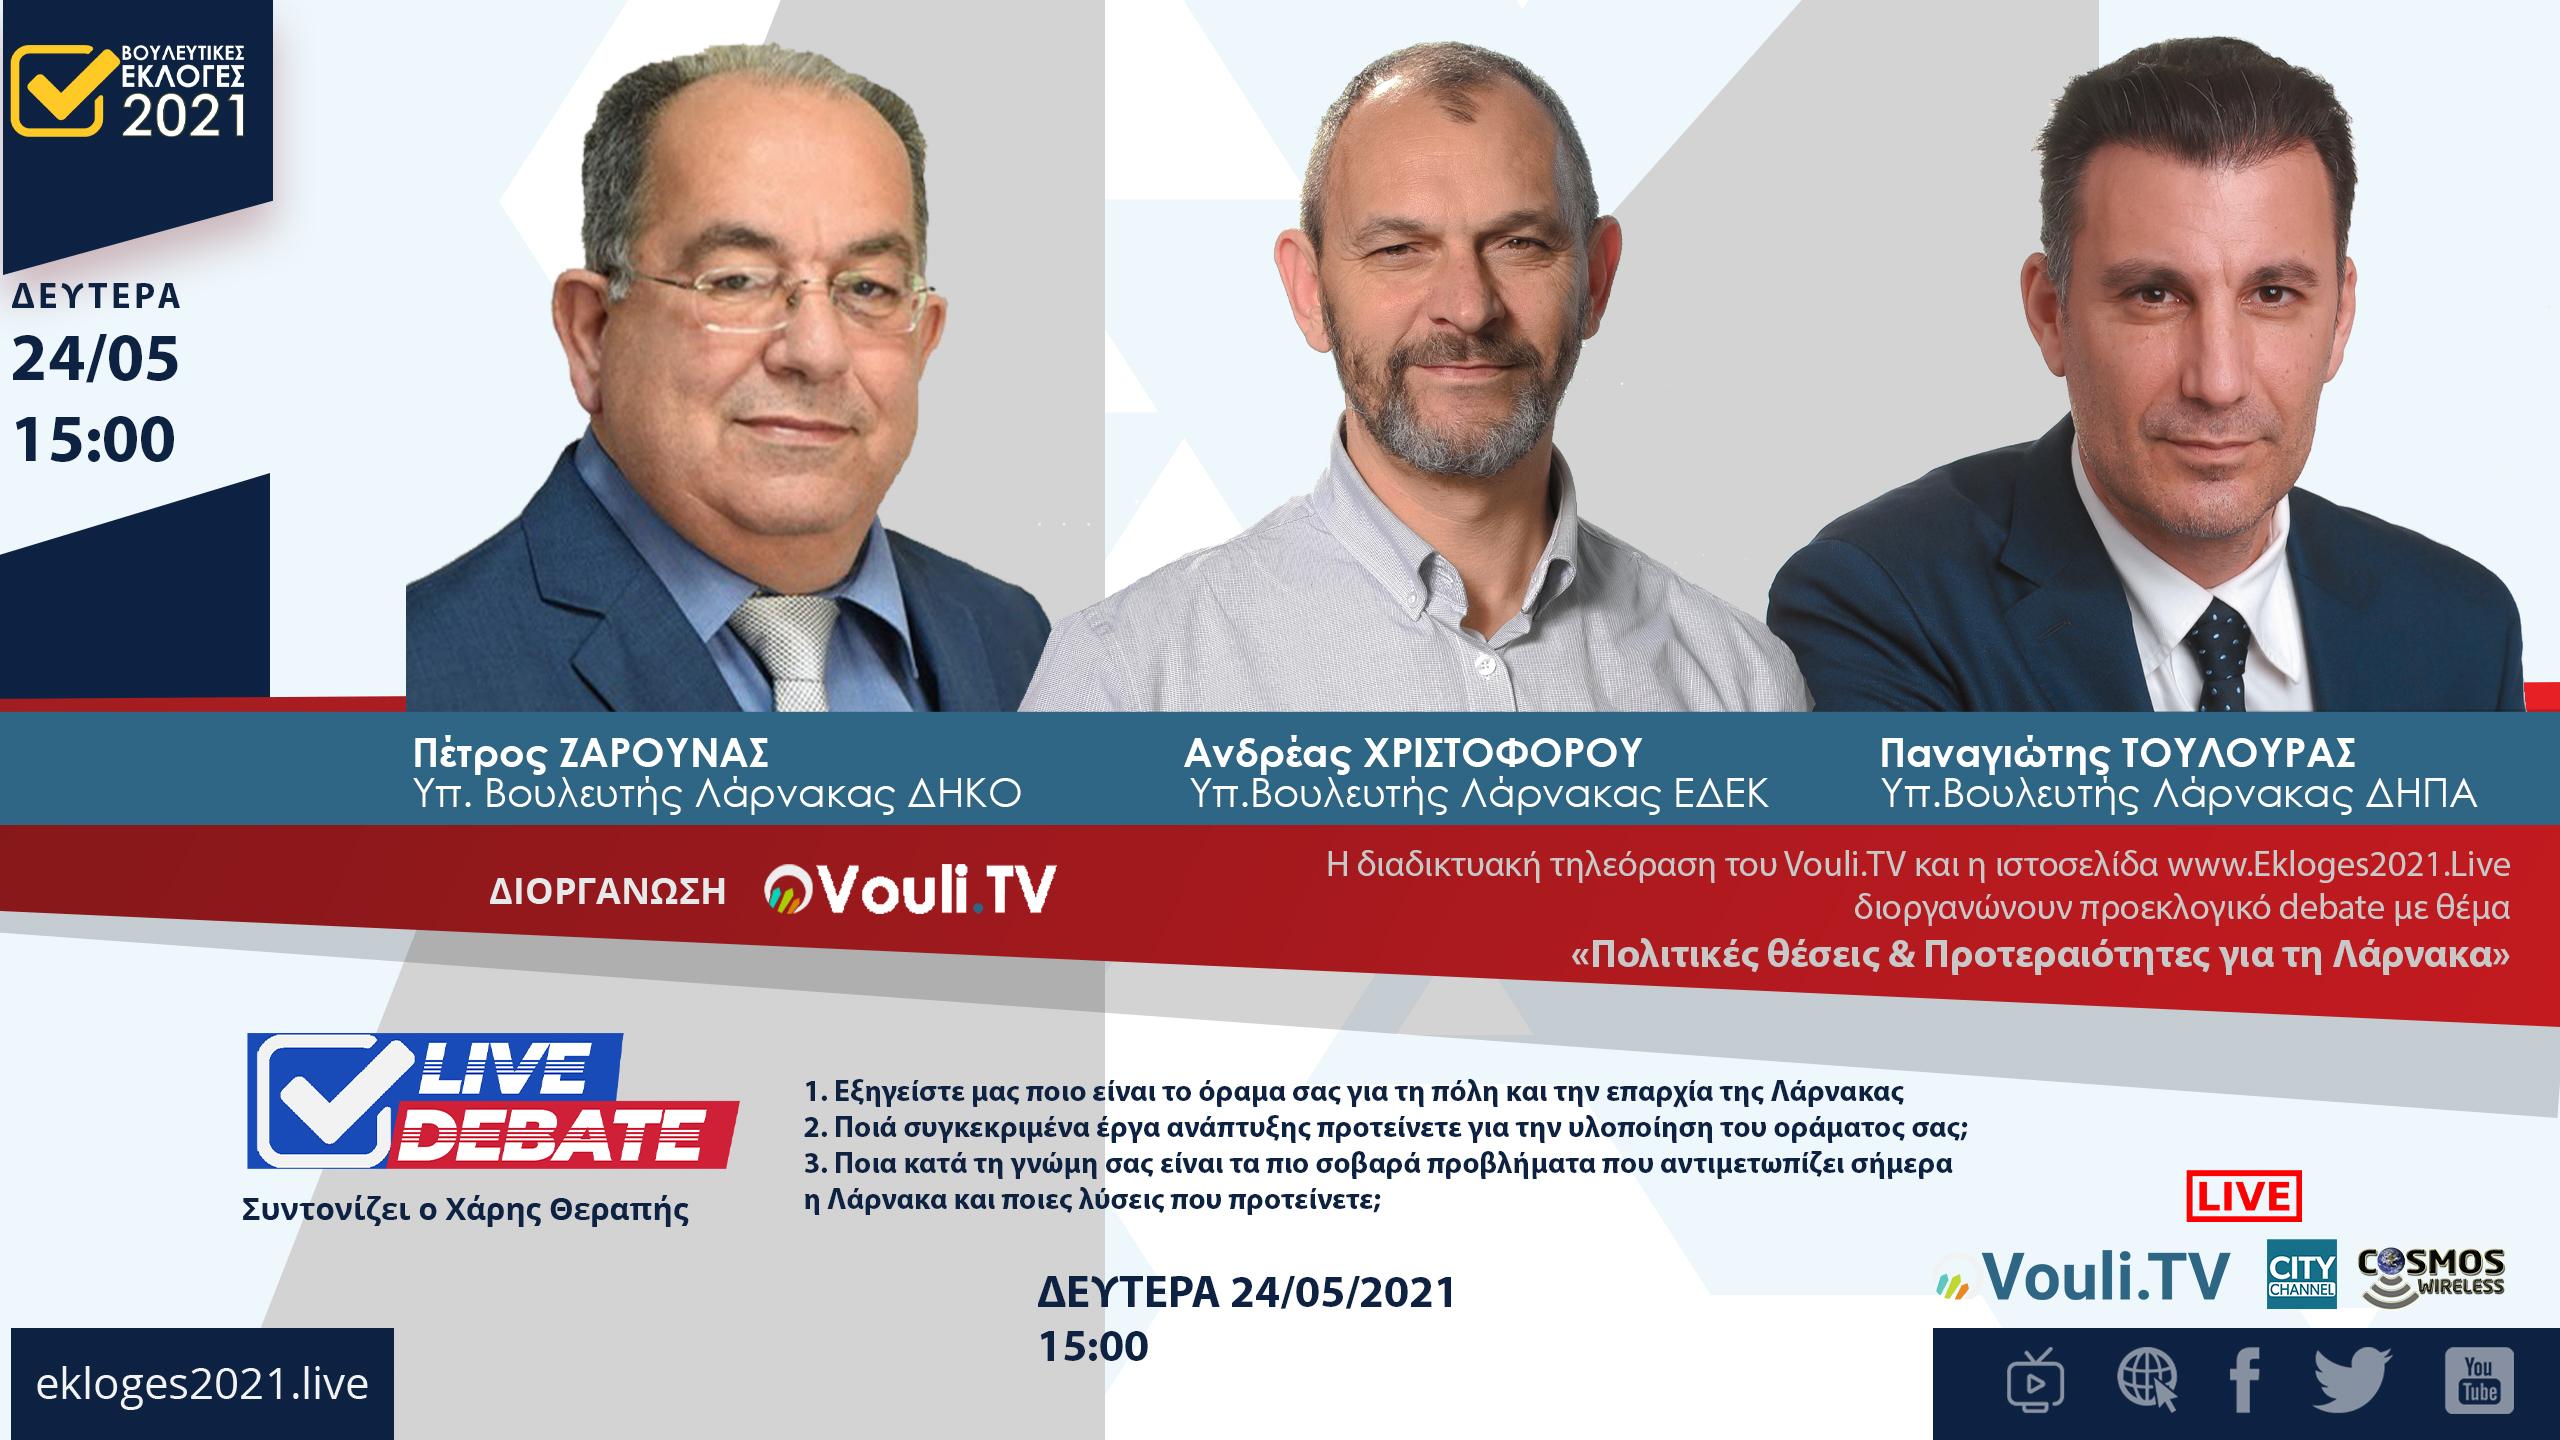 LIVE DEBATE «Πολιτικές θέσεις & Προτεραιότητες για τη Λάρνακα»   Δευτέρα 24/05 @3μμ